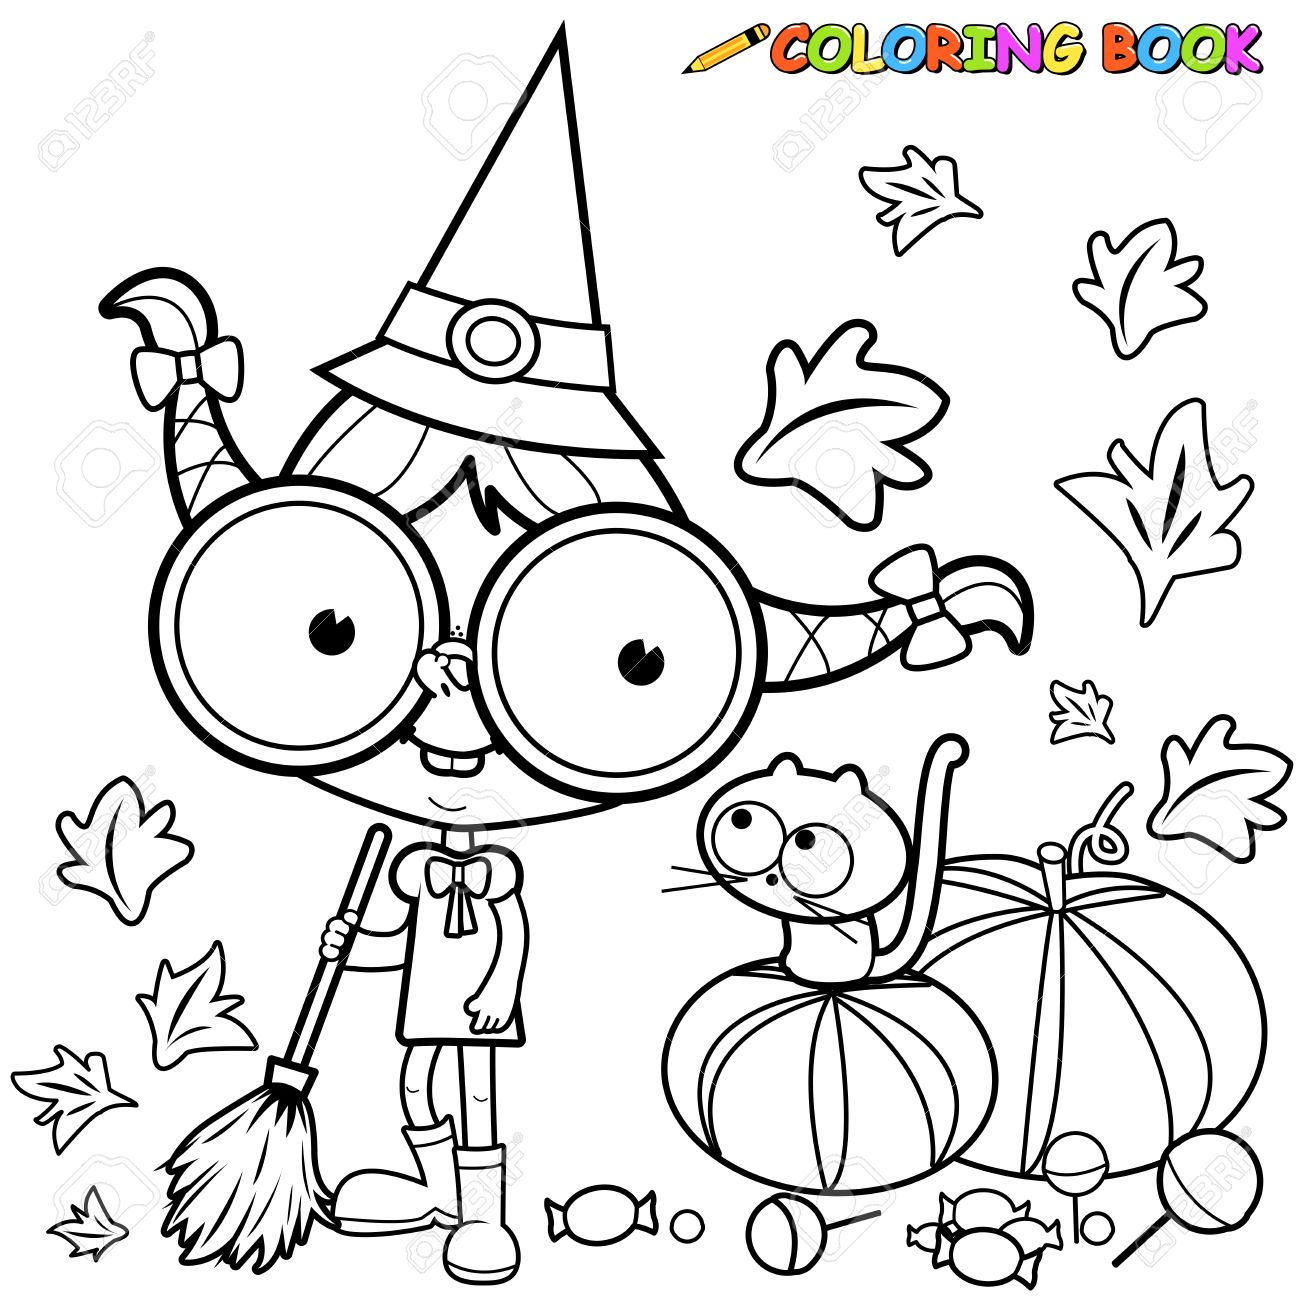 Dibujos Para Colorear De Brujas. Affordable Related Posts Dibujo De ...